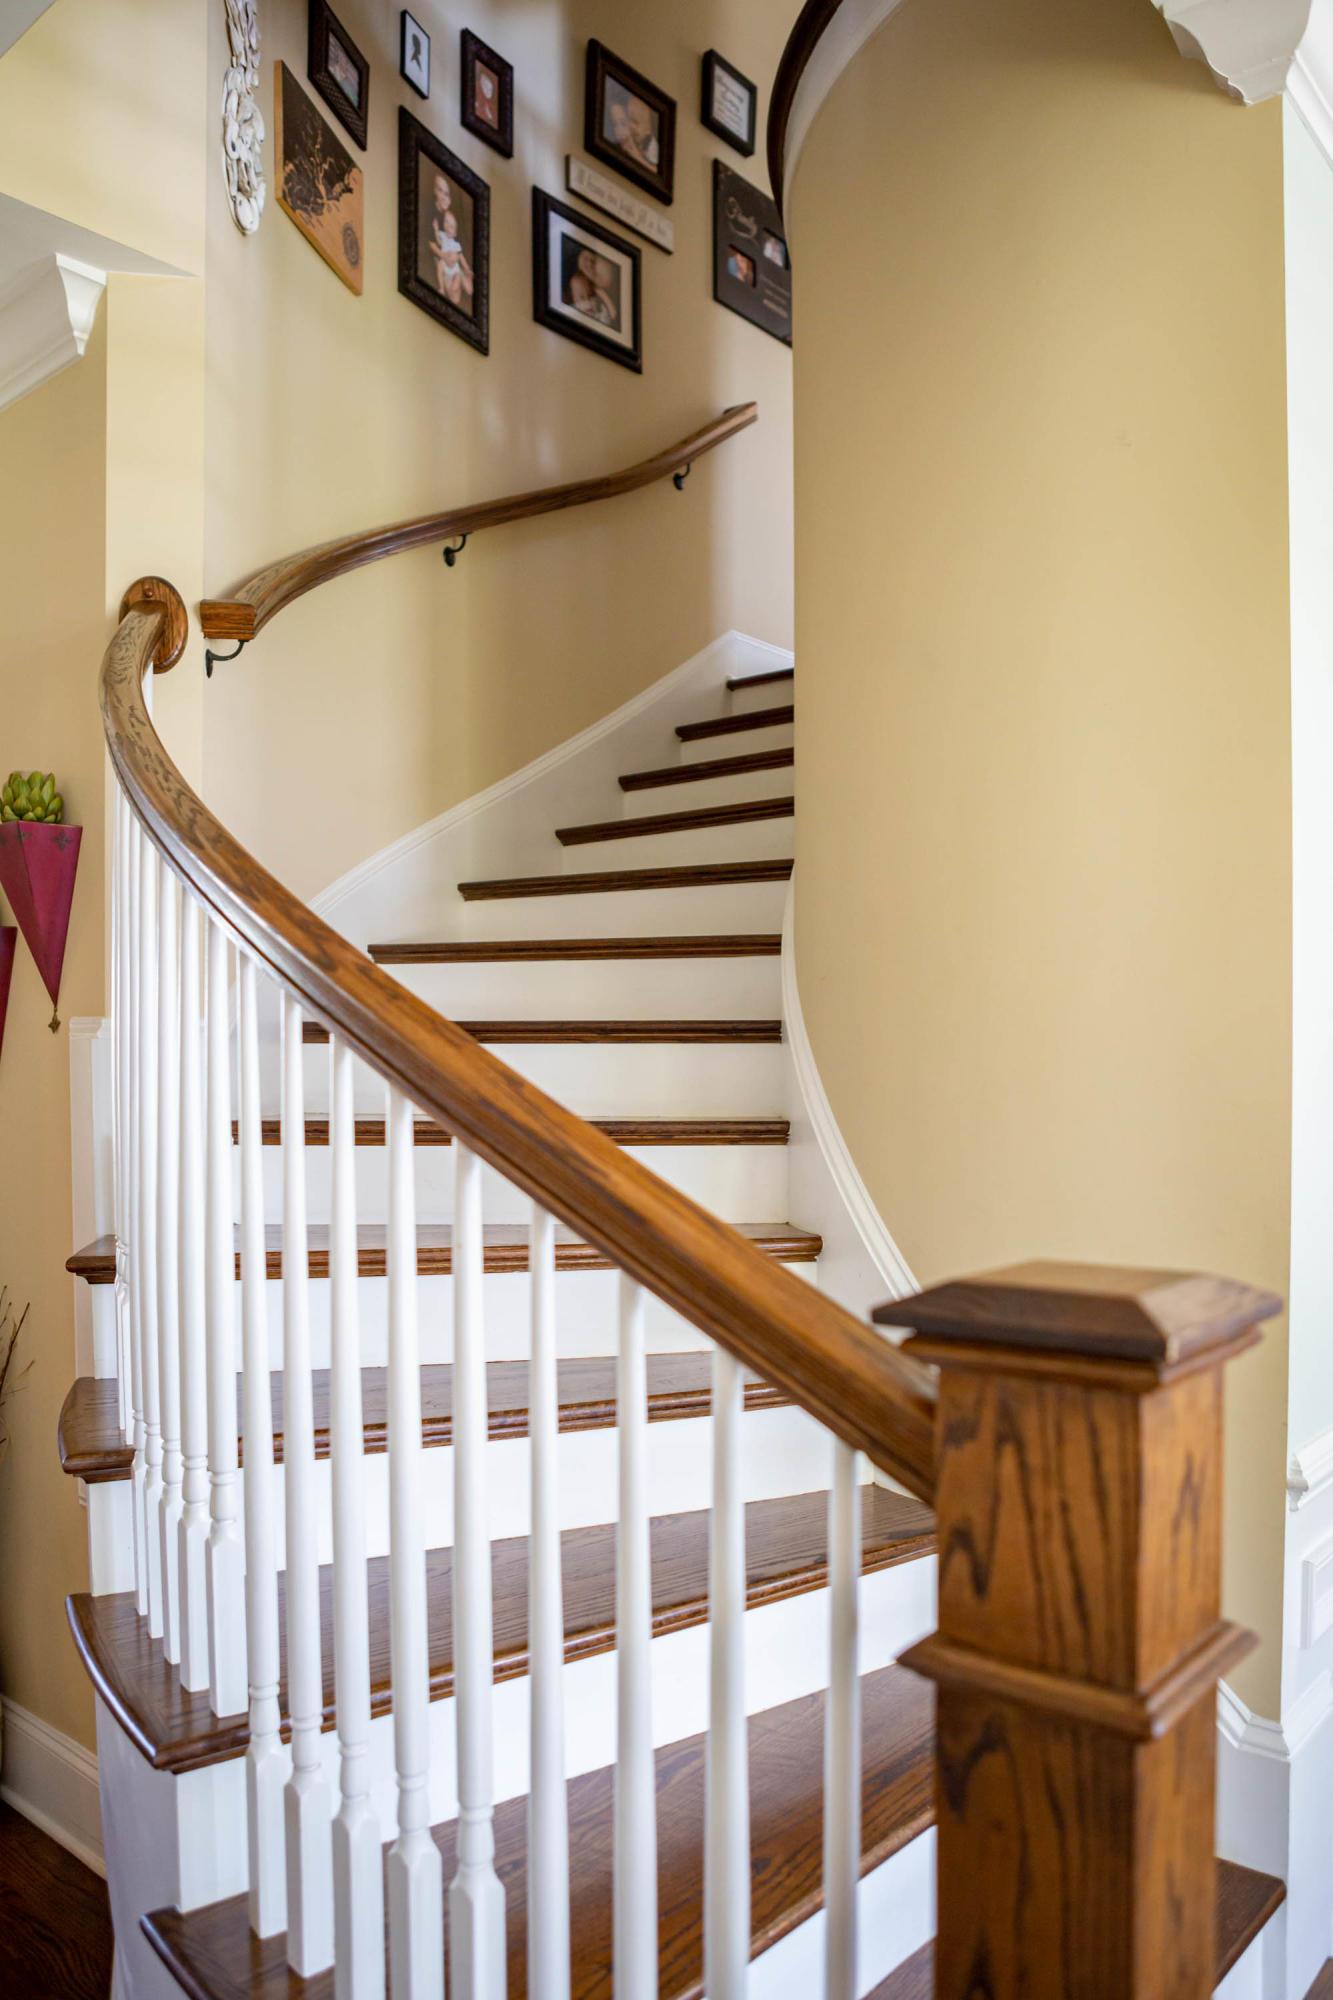 Dunes West Homes For Sale - 3216 Hatchway, Mount Pleasant, SC - 31